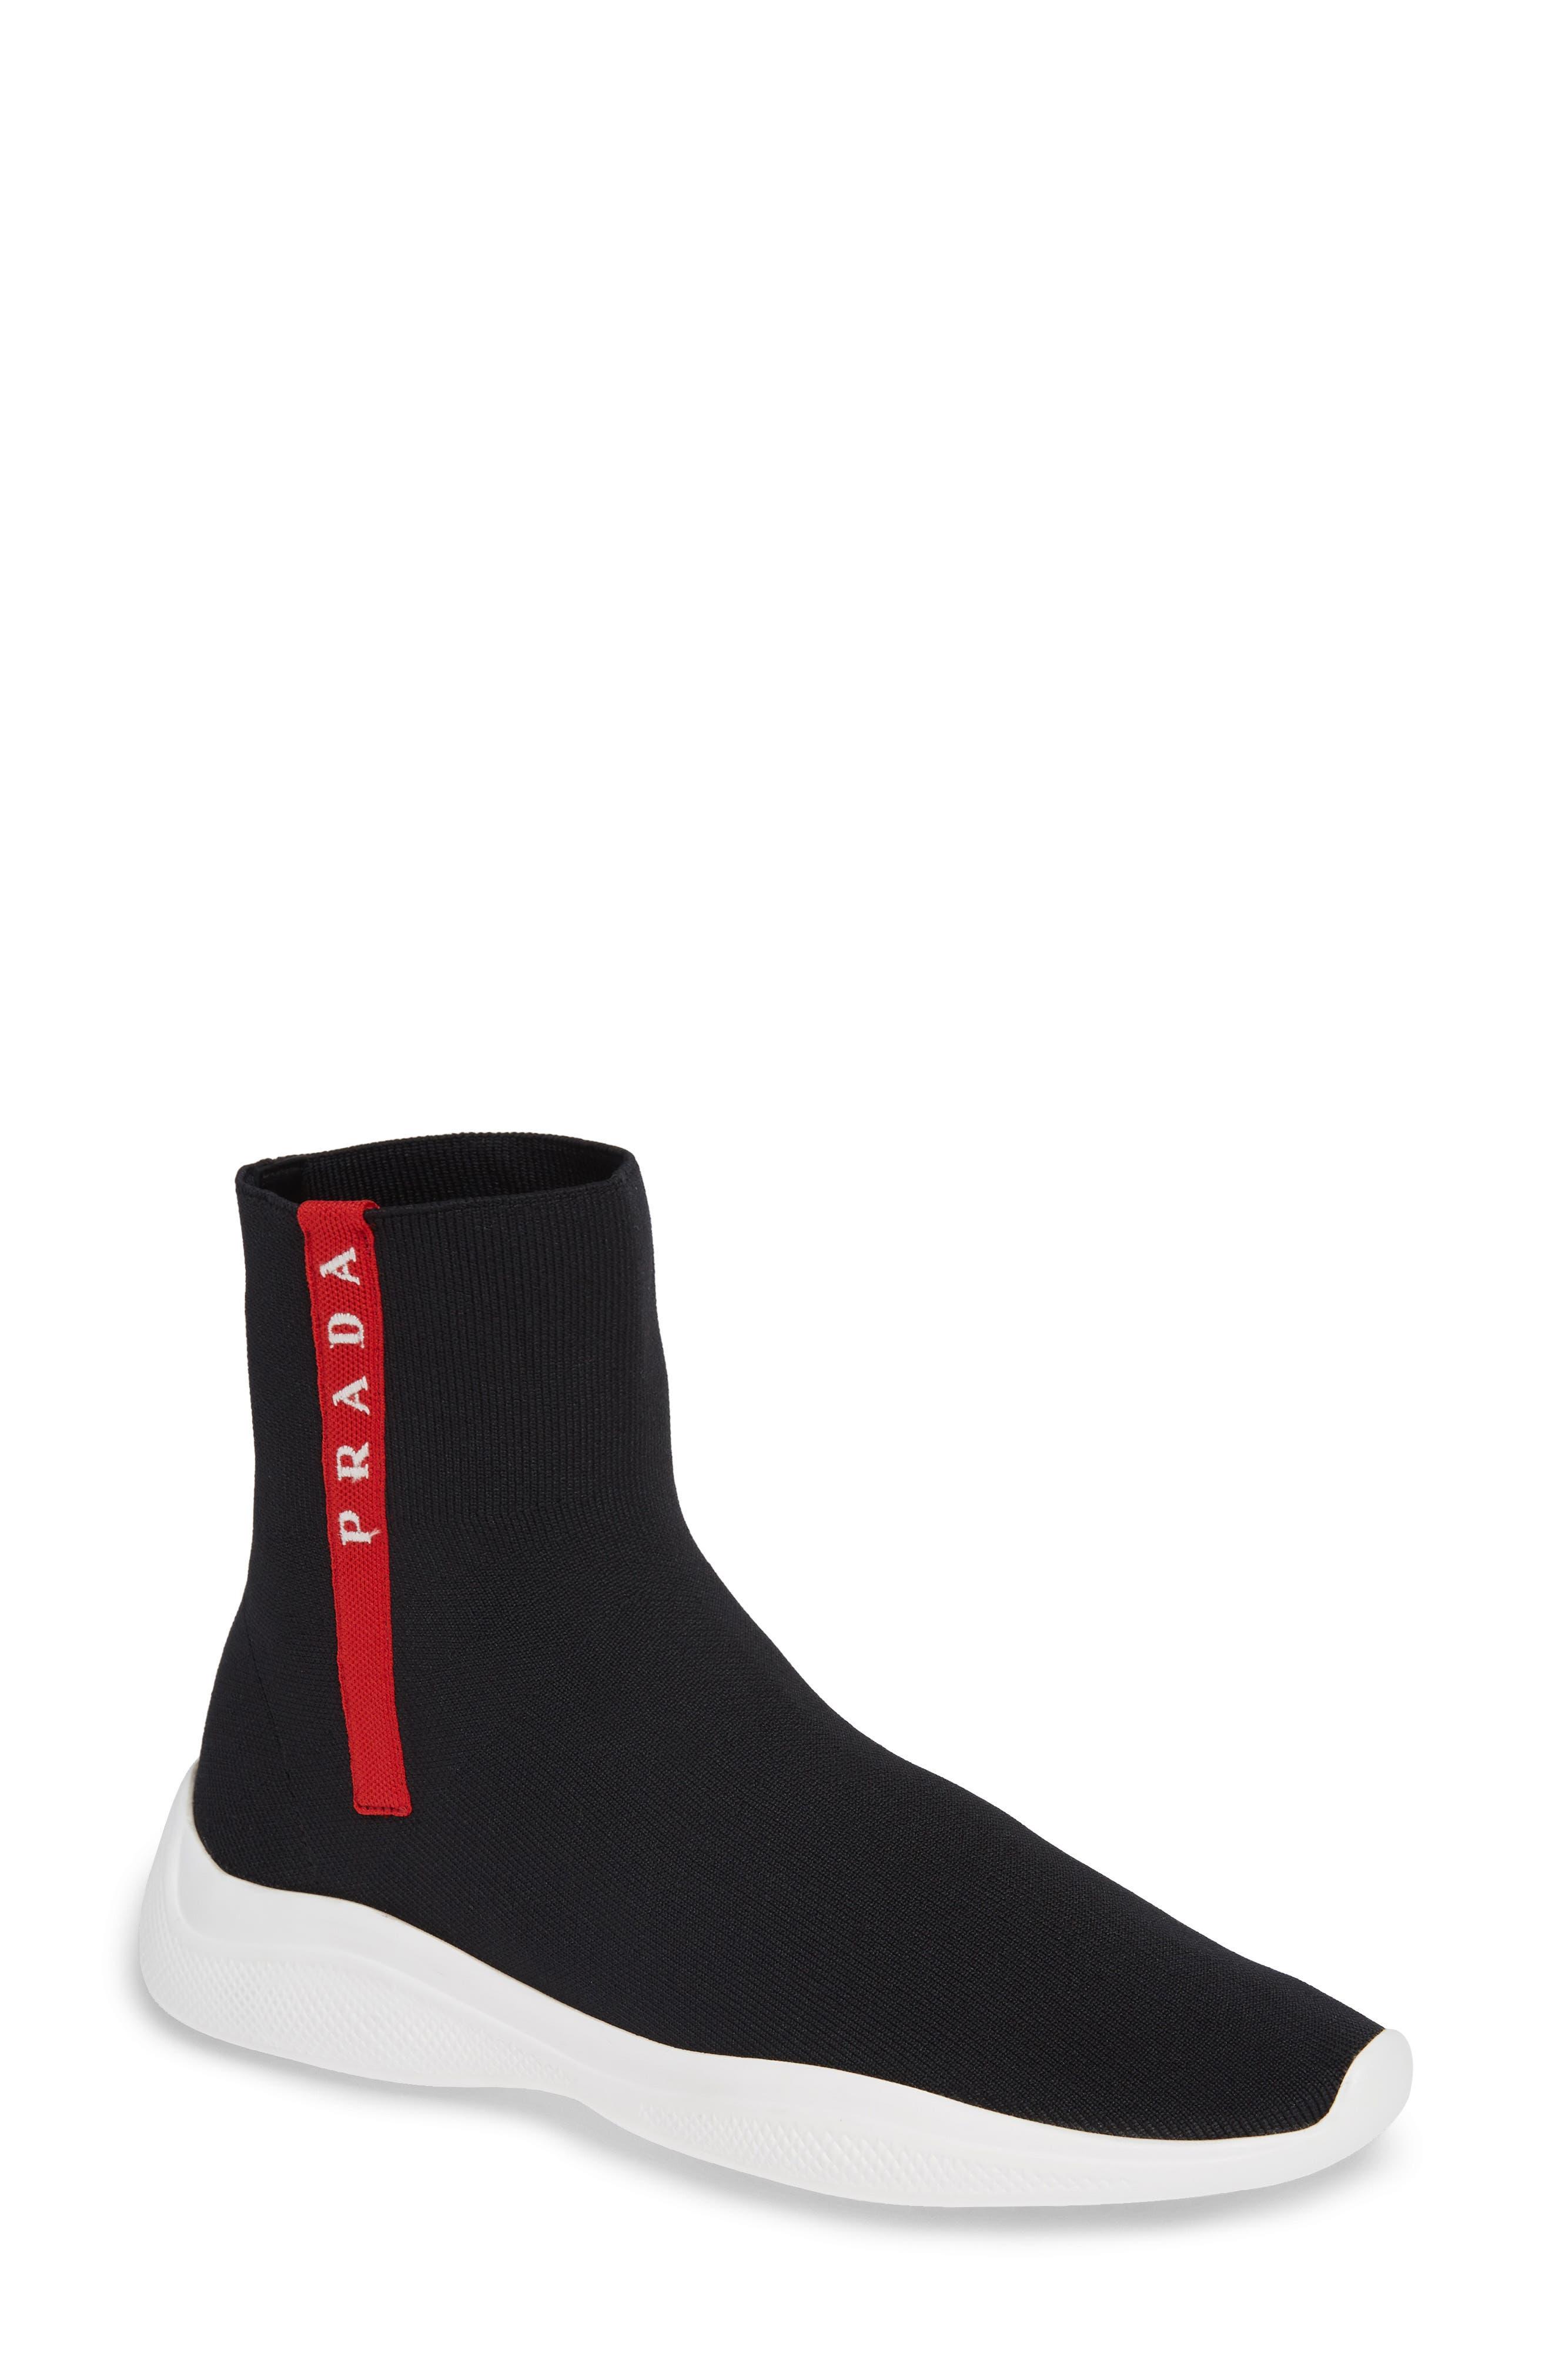 Women's Sneakers Shoes Running Nordstrom Prada amp; q4wqr5T0